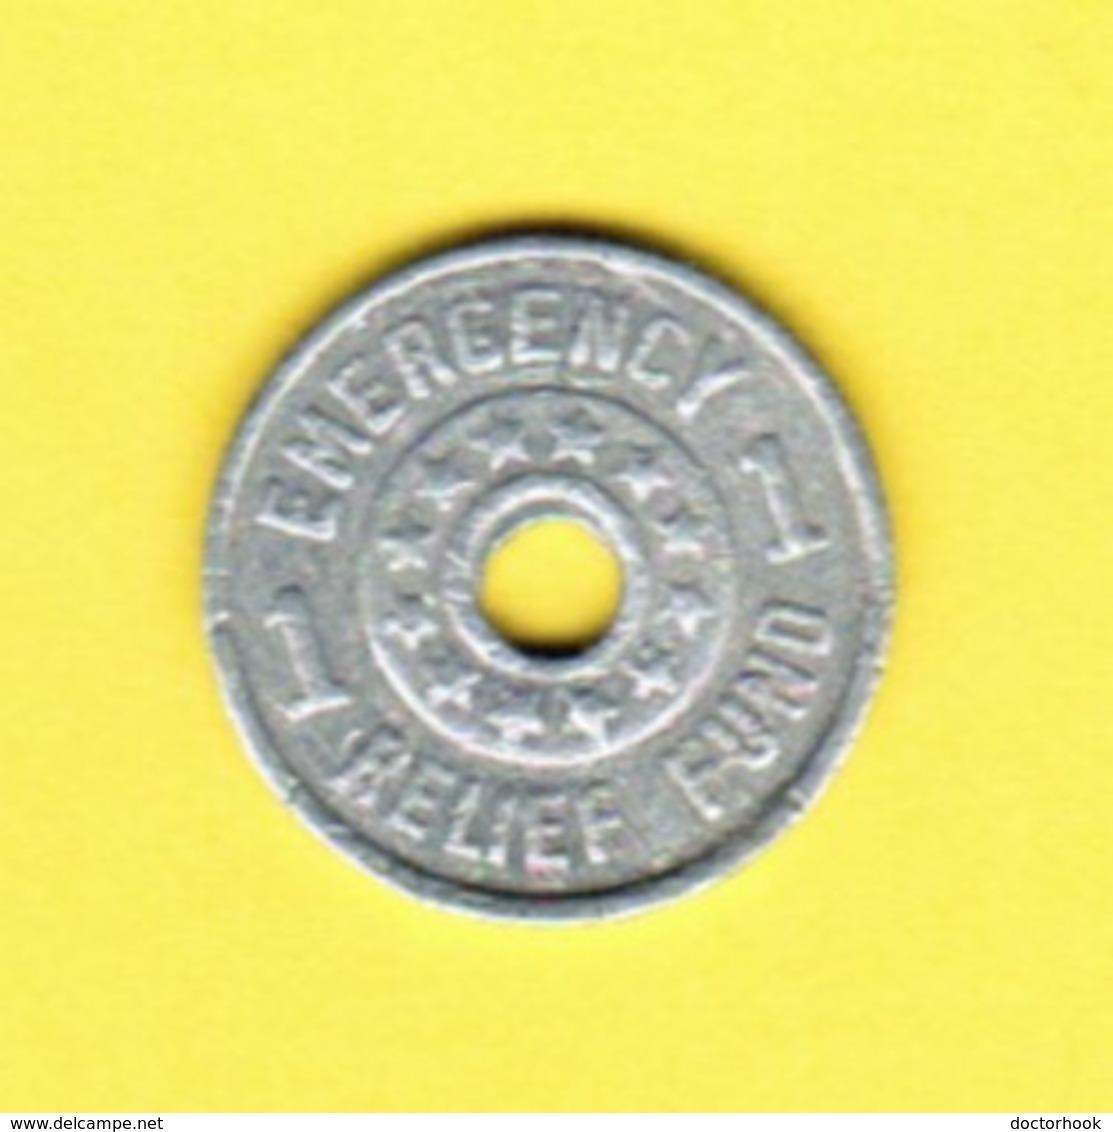 U.S.A.    UTAH EMERGENCY RELIEF FUND SALES TAX Token (T17) - USA